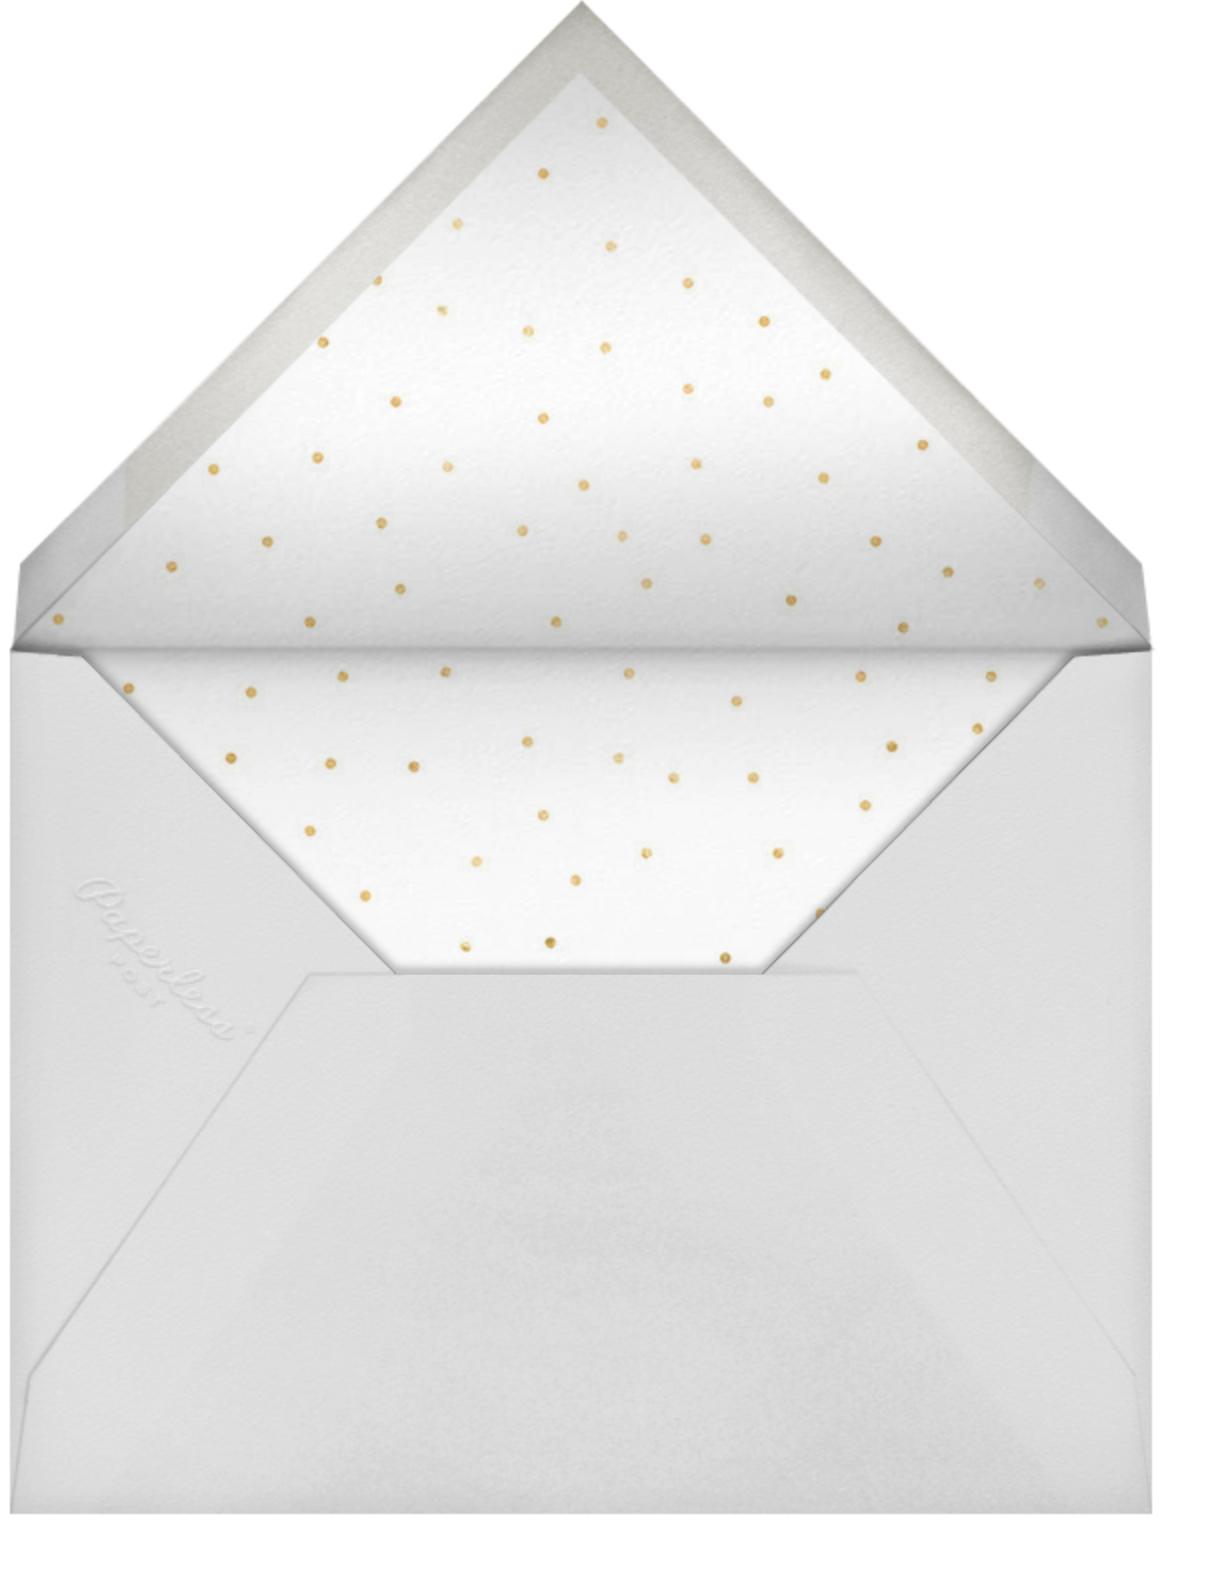 Eat Cake Make Wishes - Navy/White - Sugar Paper - Adult birthday - envelope back